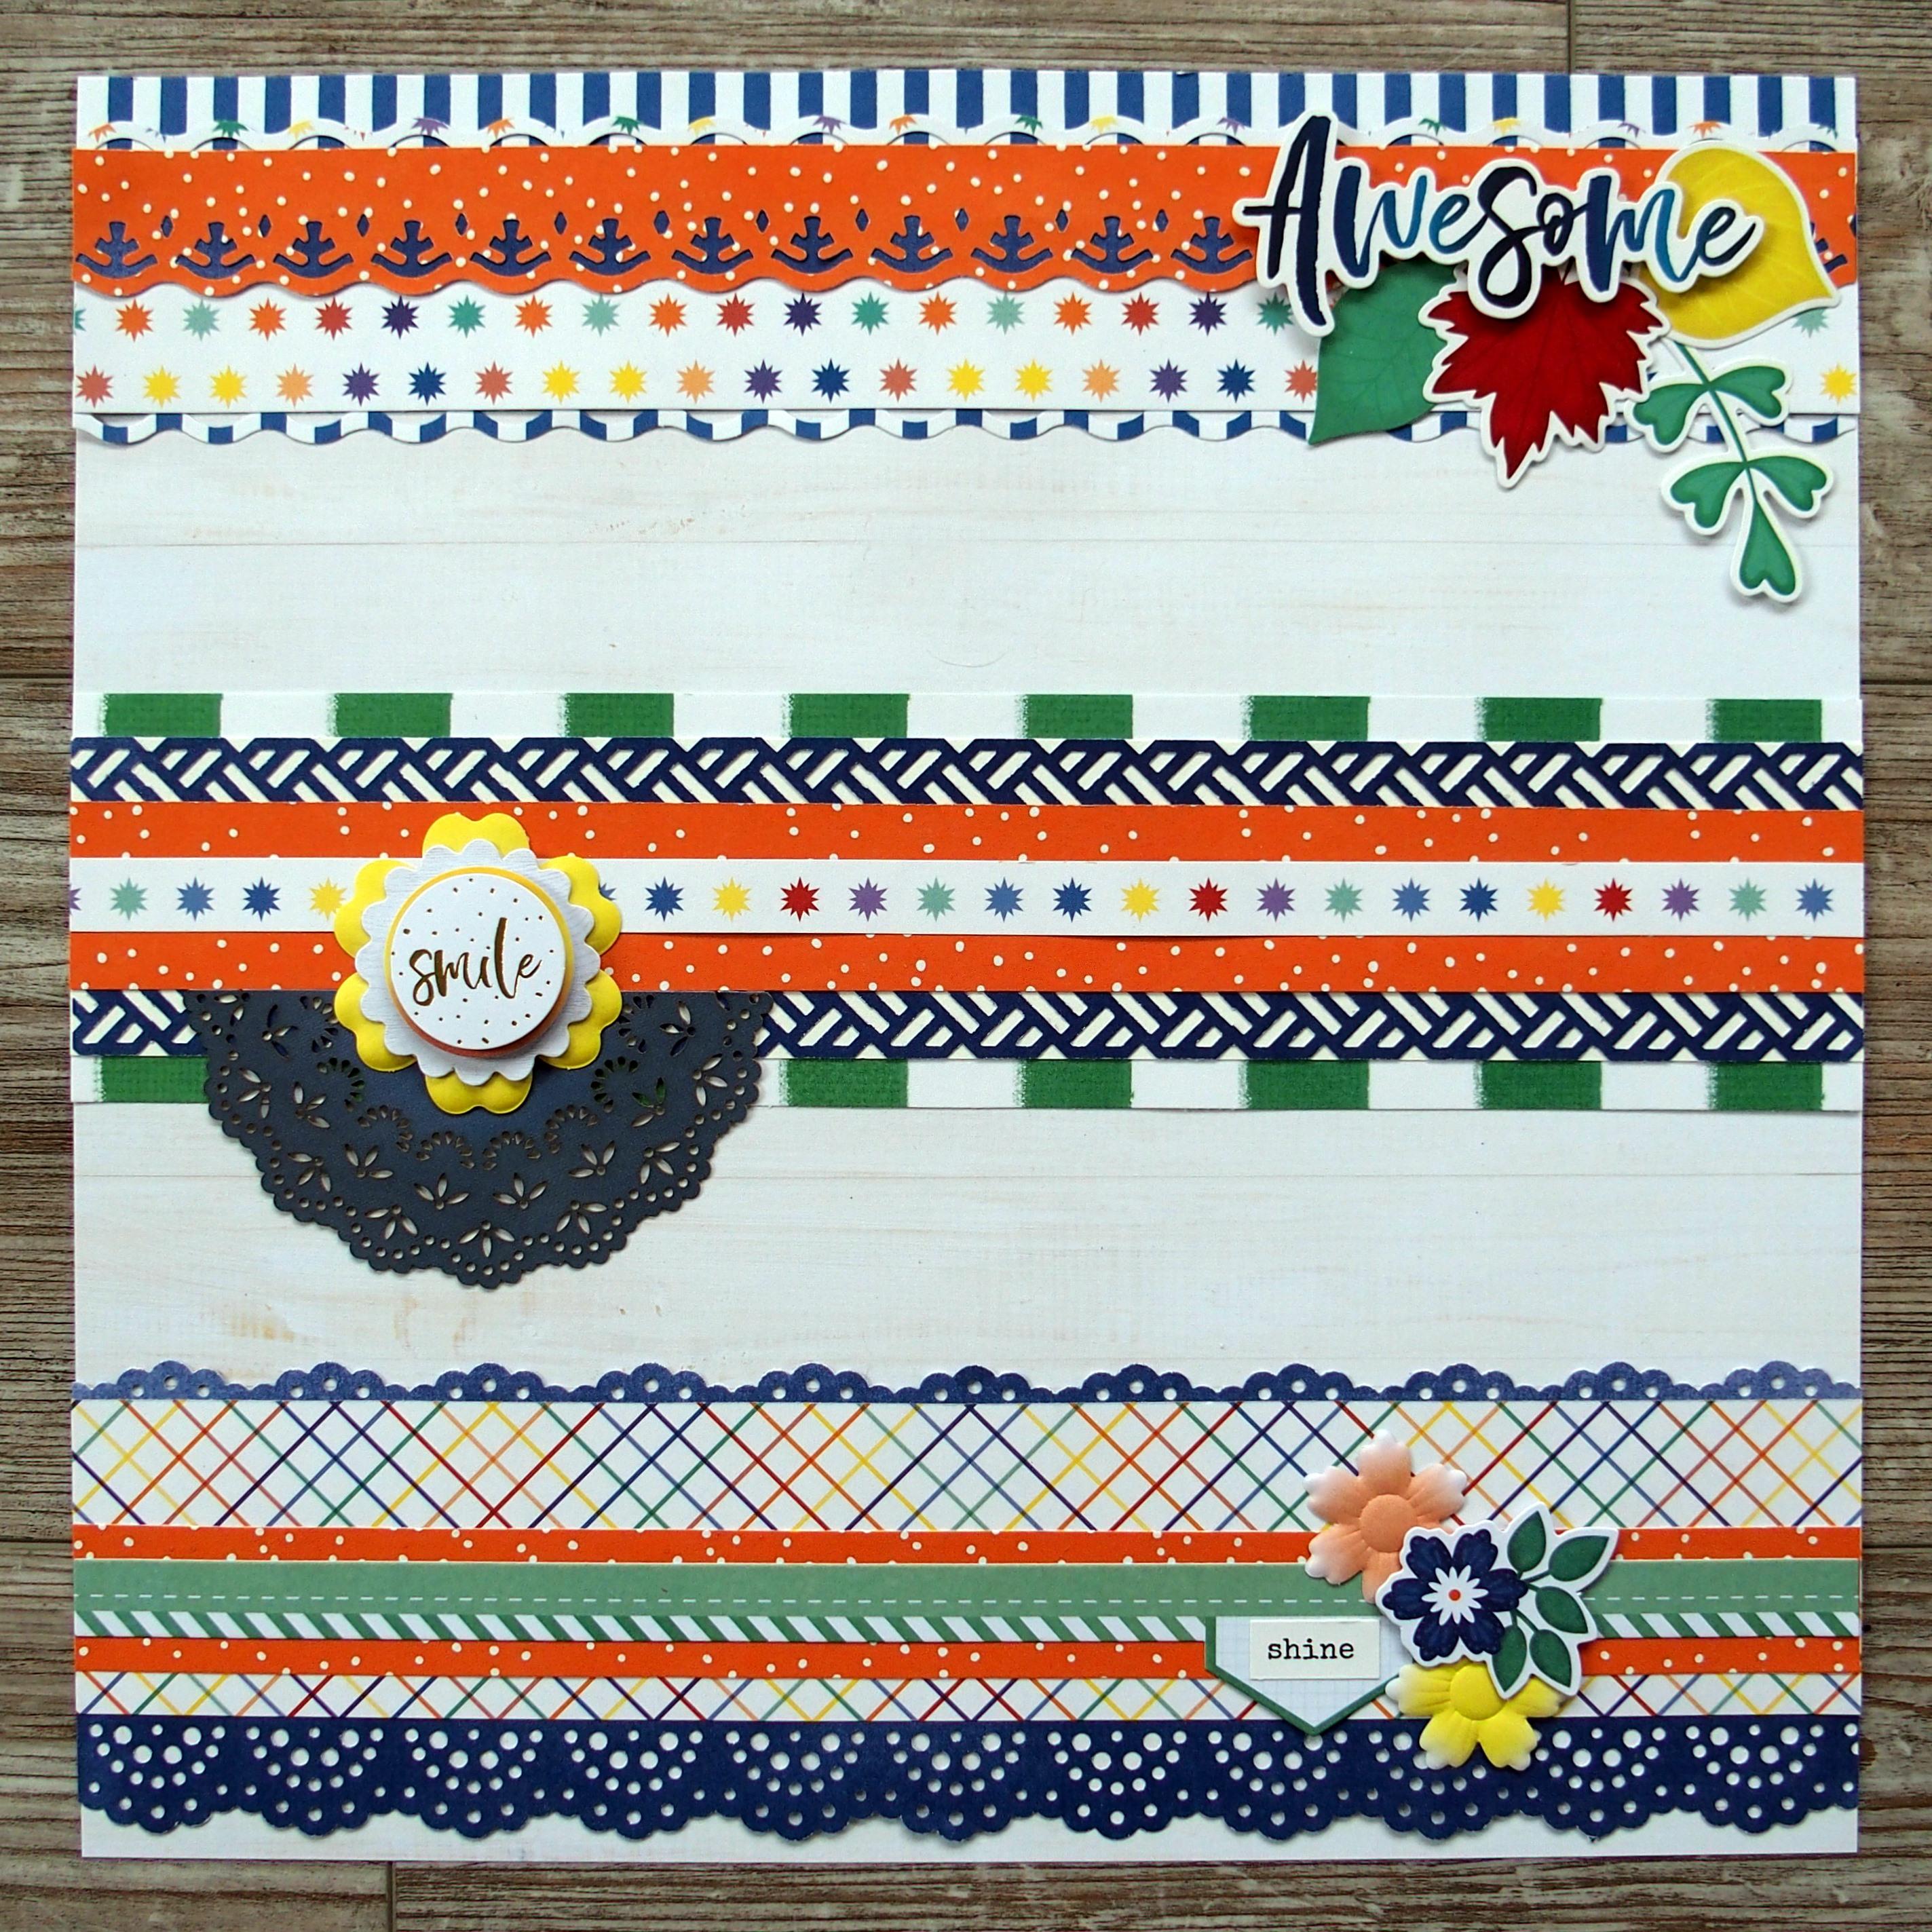 Rainbow-Rush-Collection-Scrapbooking-Borders-Creative-Memories-15